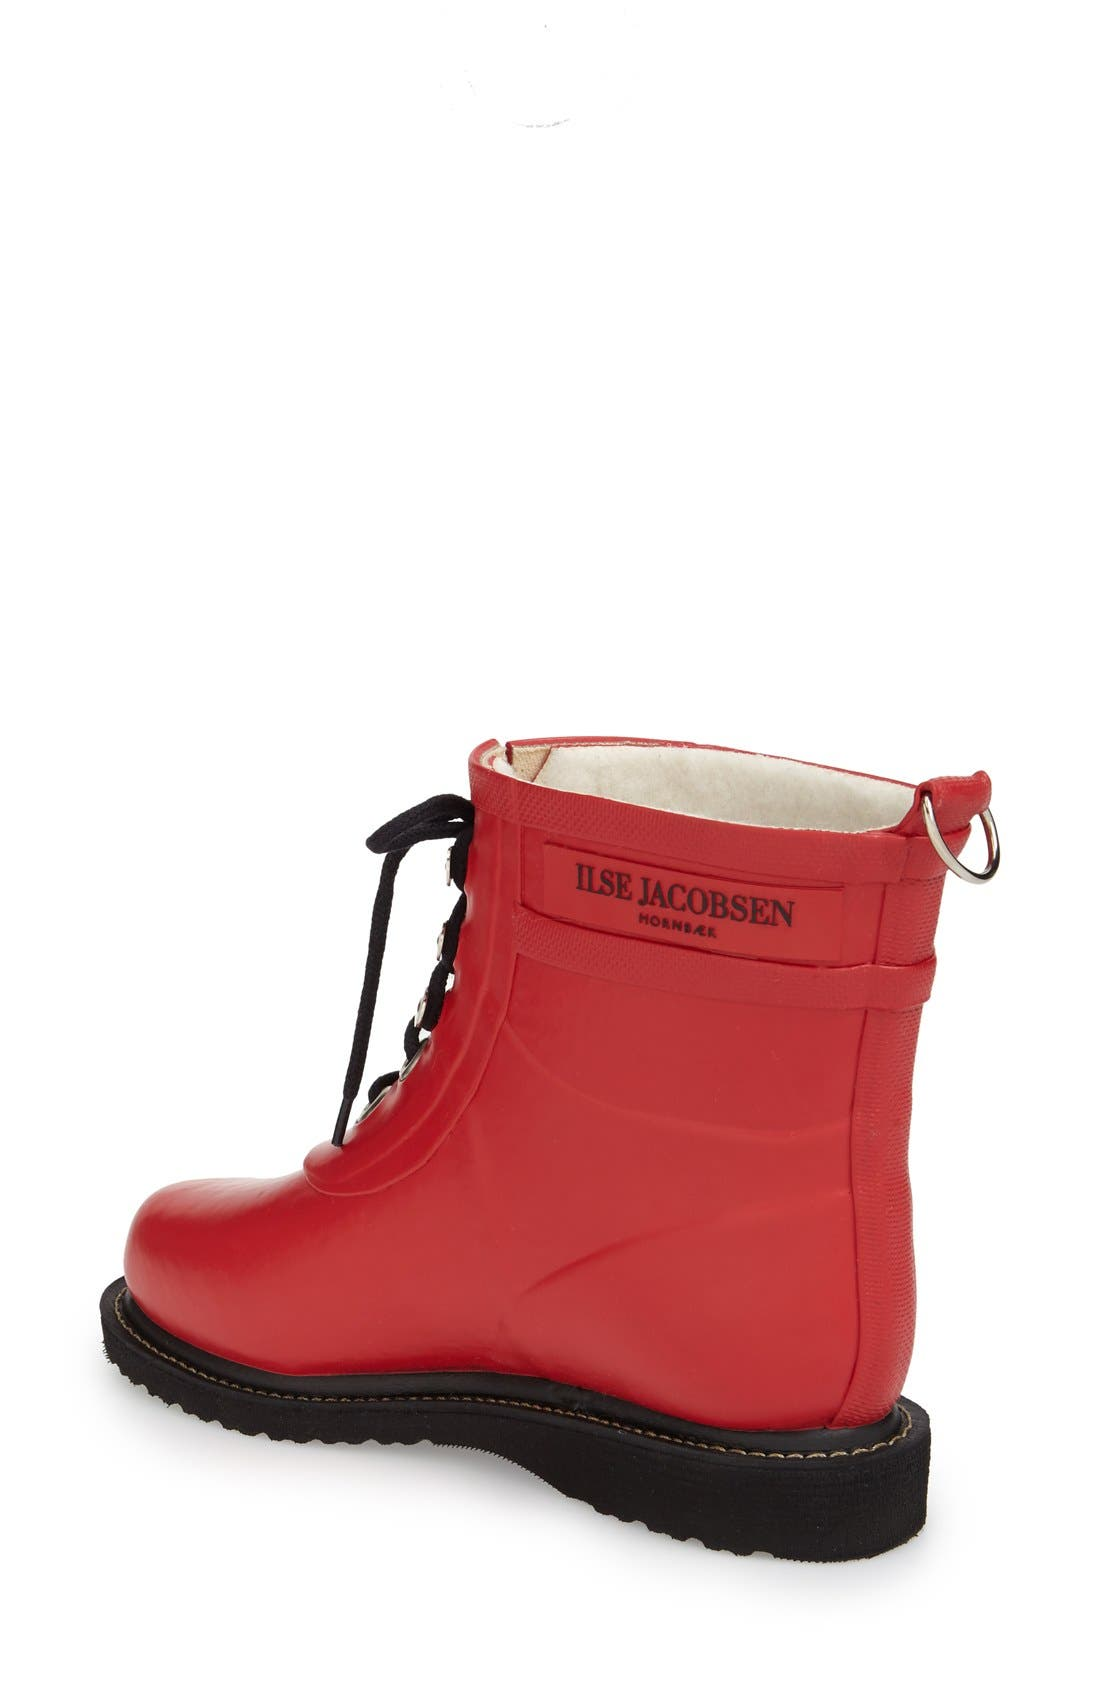 ILSE JACOBSEN, 'Rub' Boot, Alternate thumbnail 2, color, DEEP RED